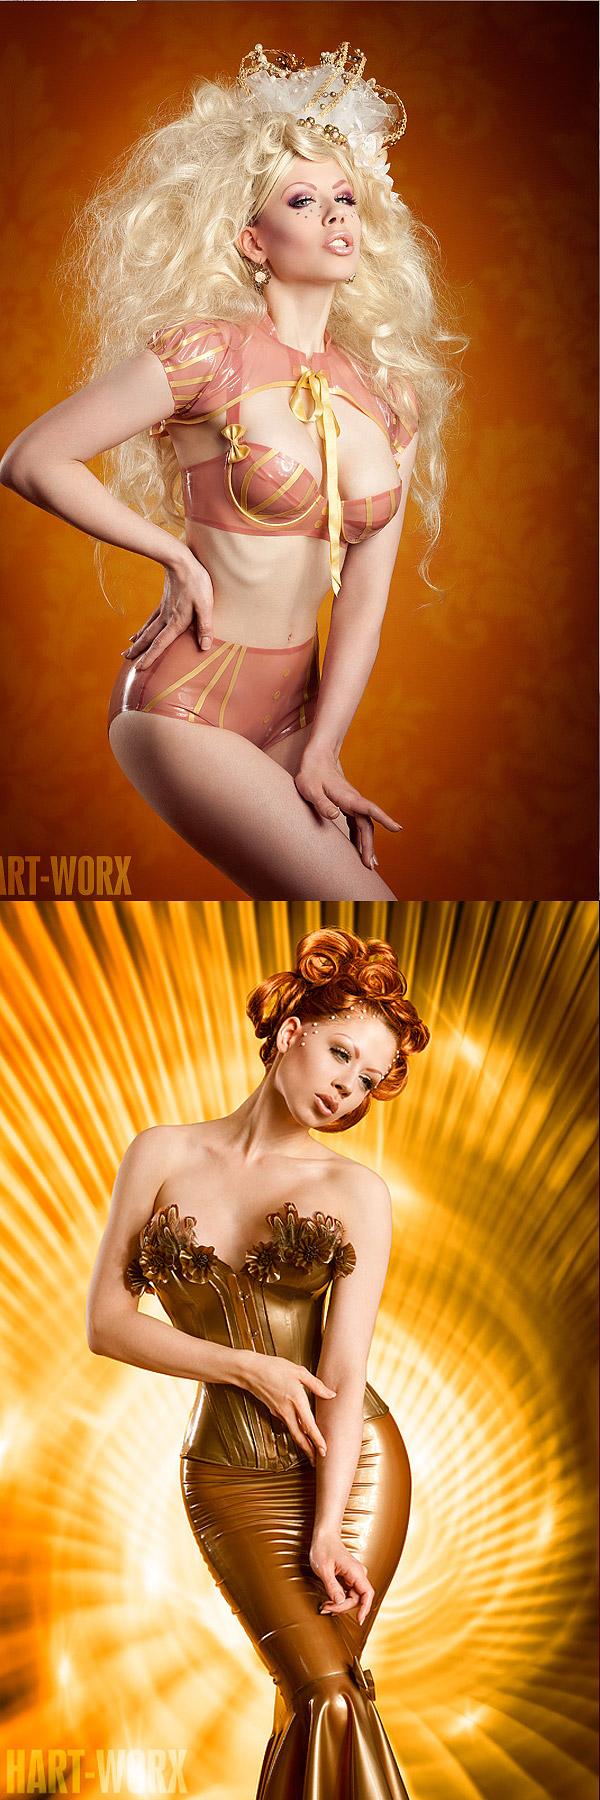 Jun 30, 2011 Hart-Worx model, make-up, styling, wig design: myself